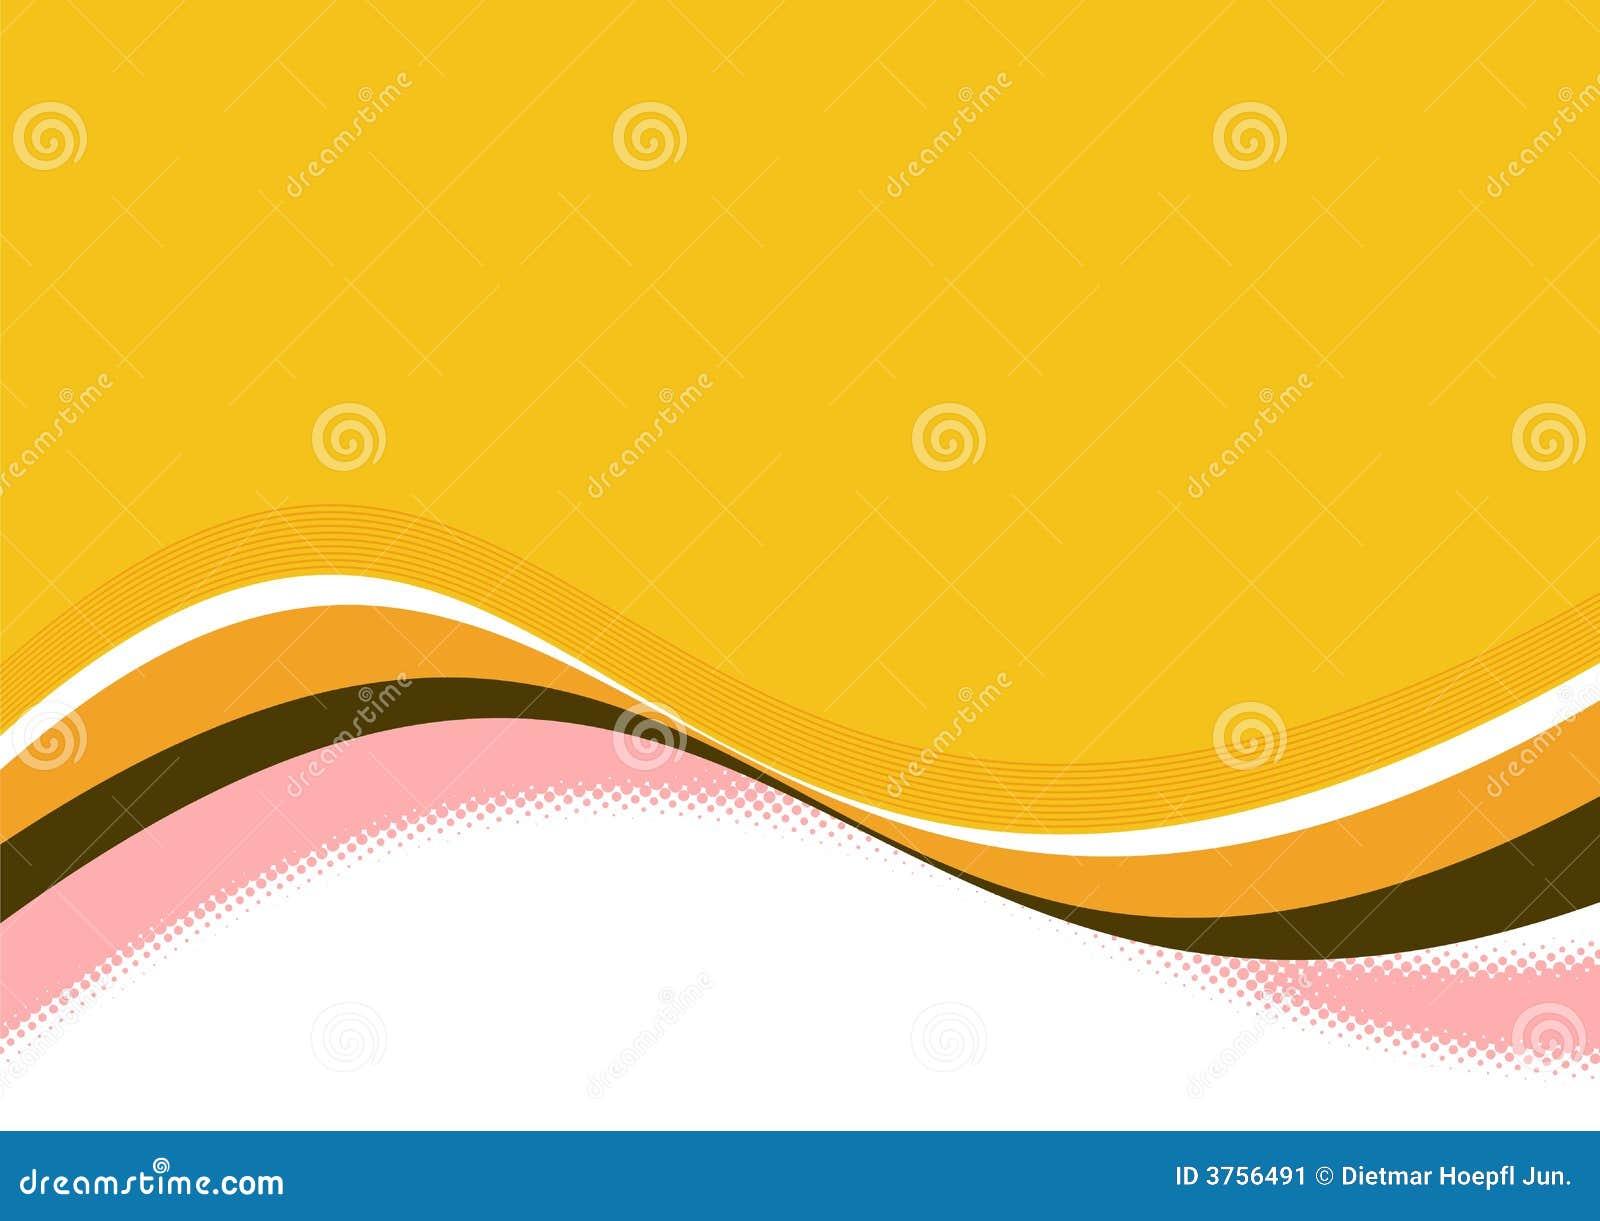 Lignes ondulées oranges